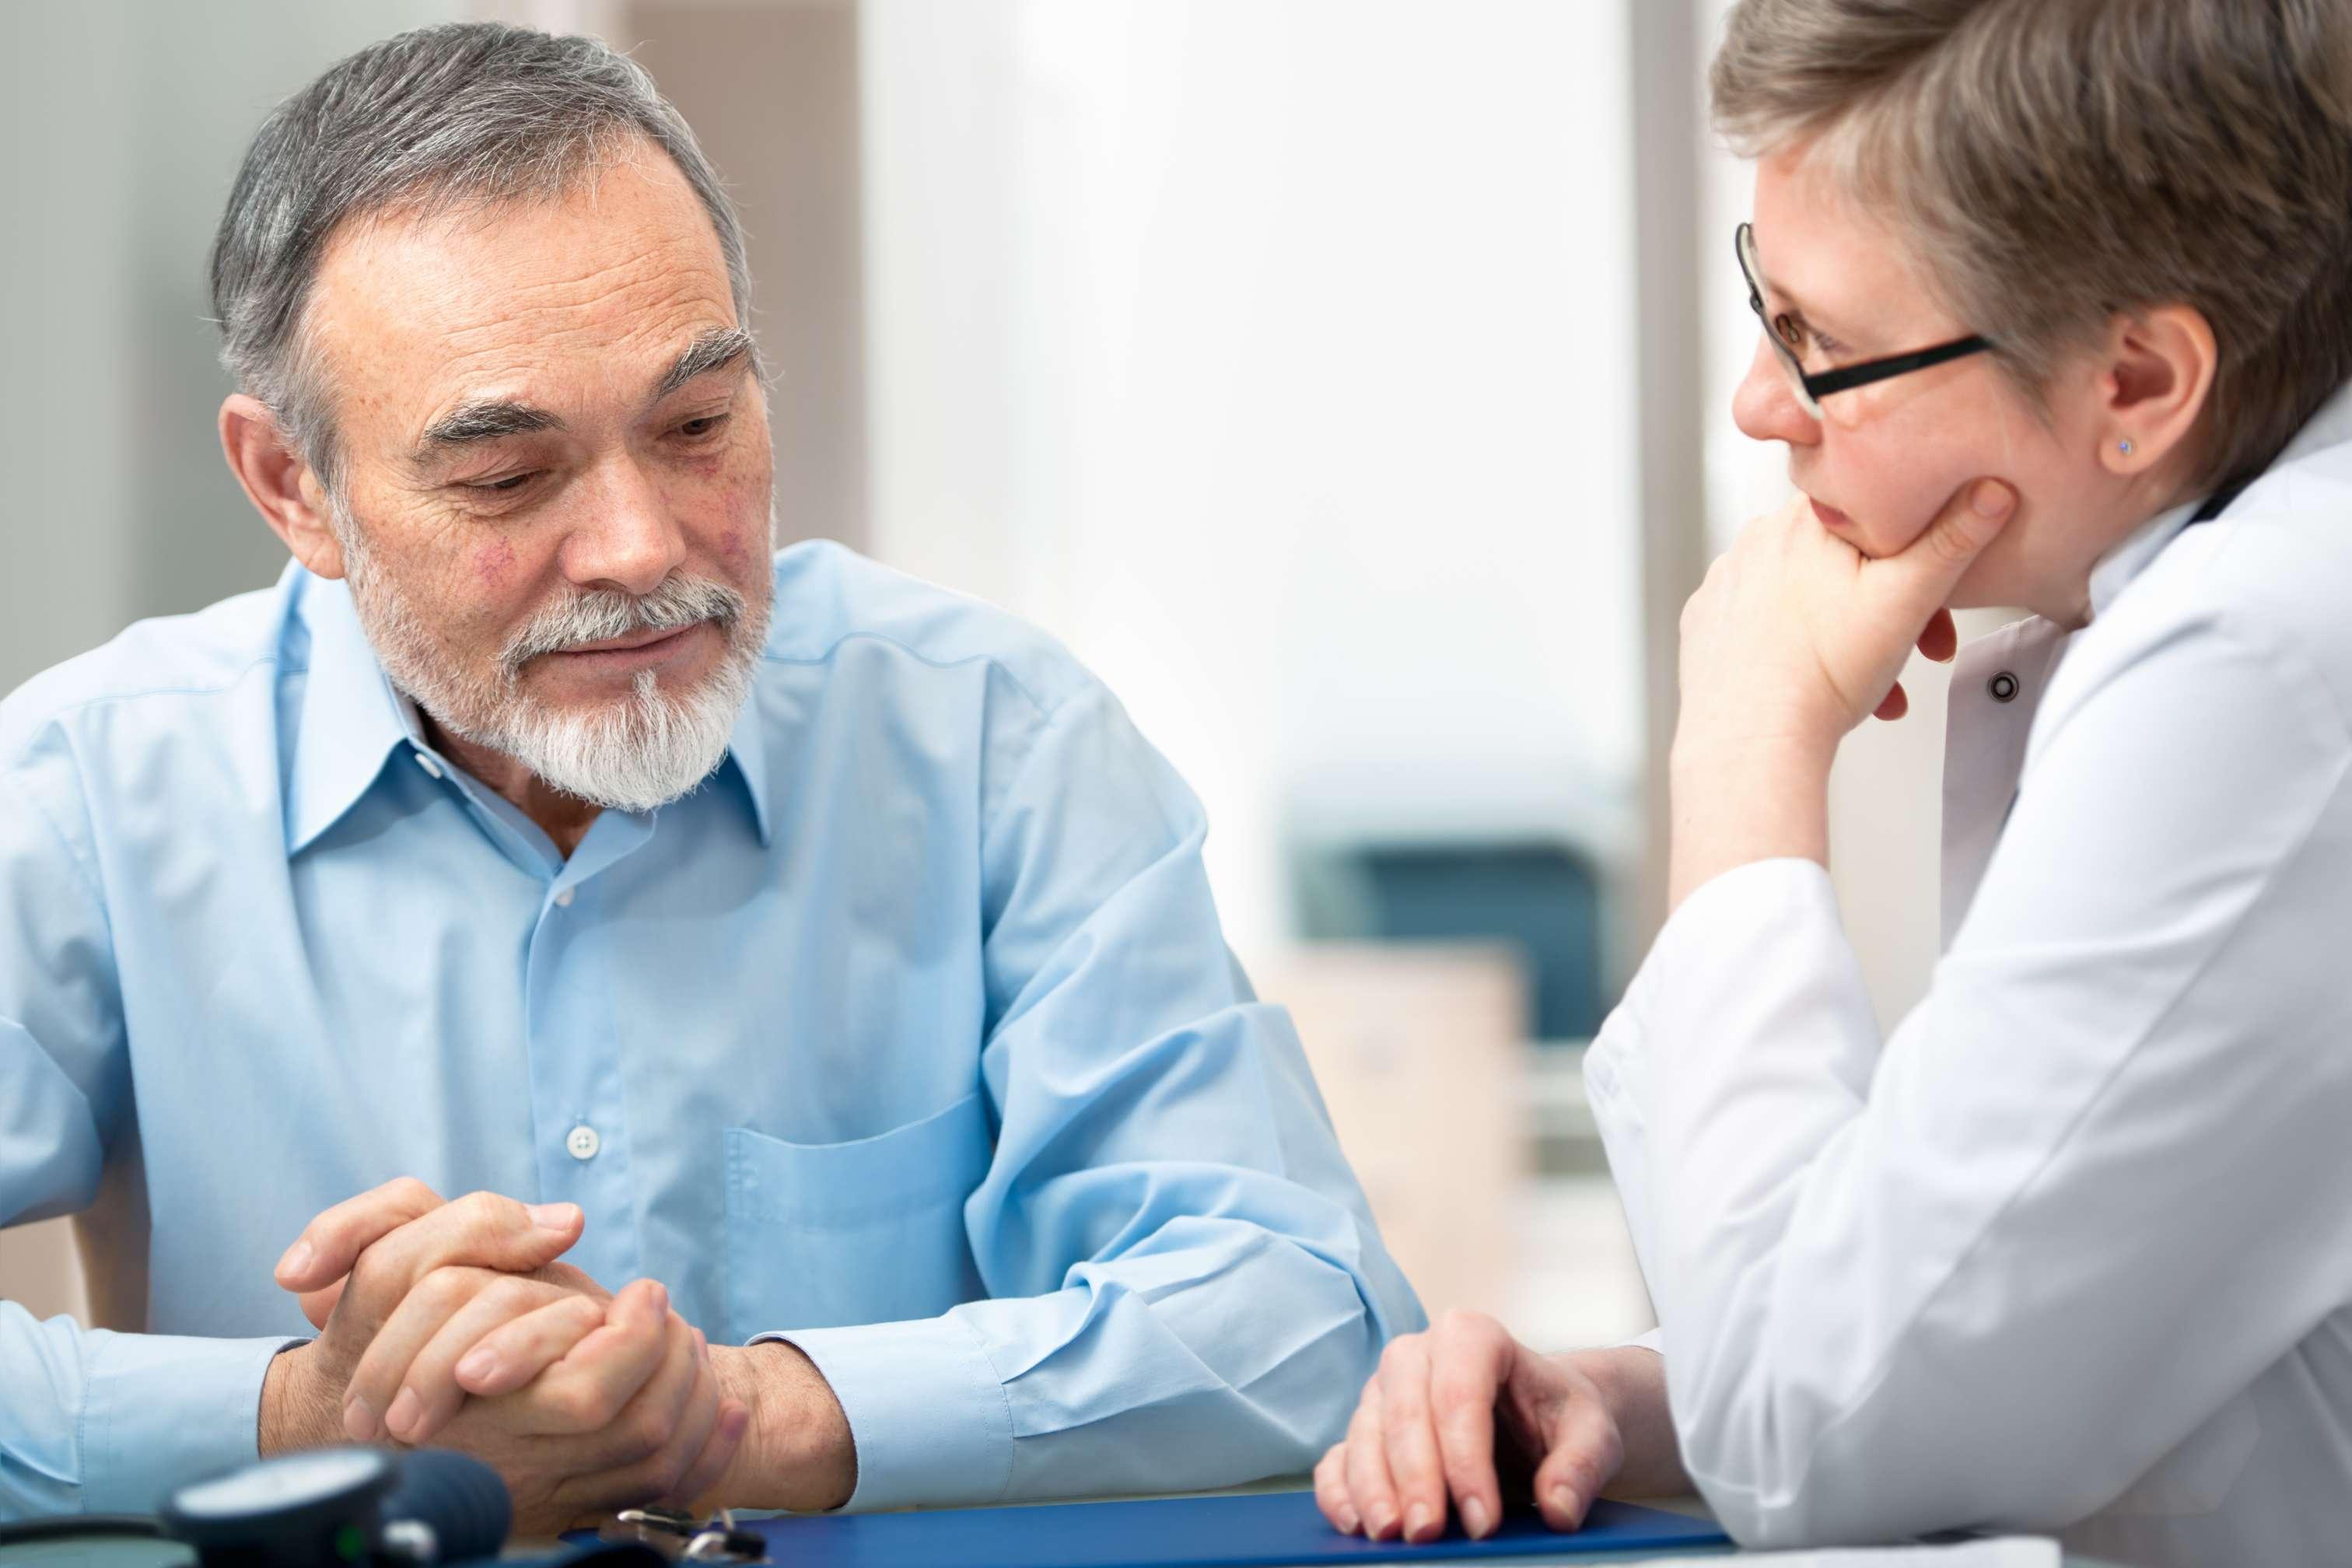 Анализы и диагностика при болях в яичках у мужчин